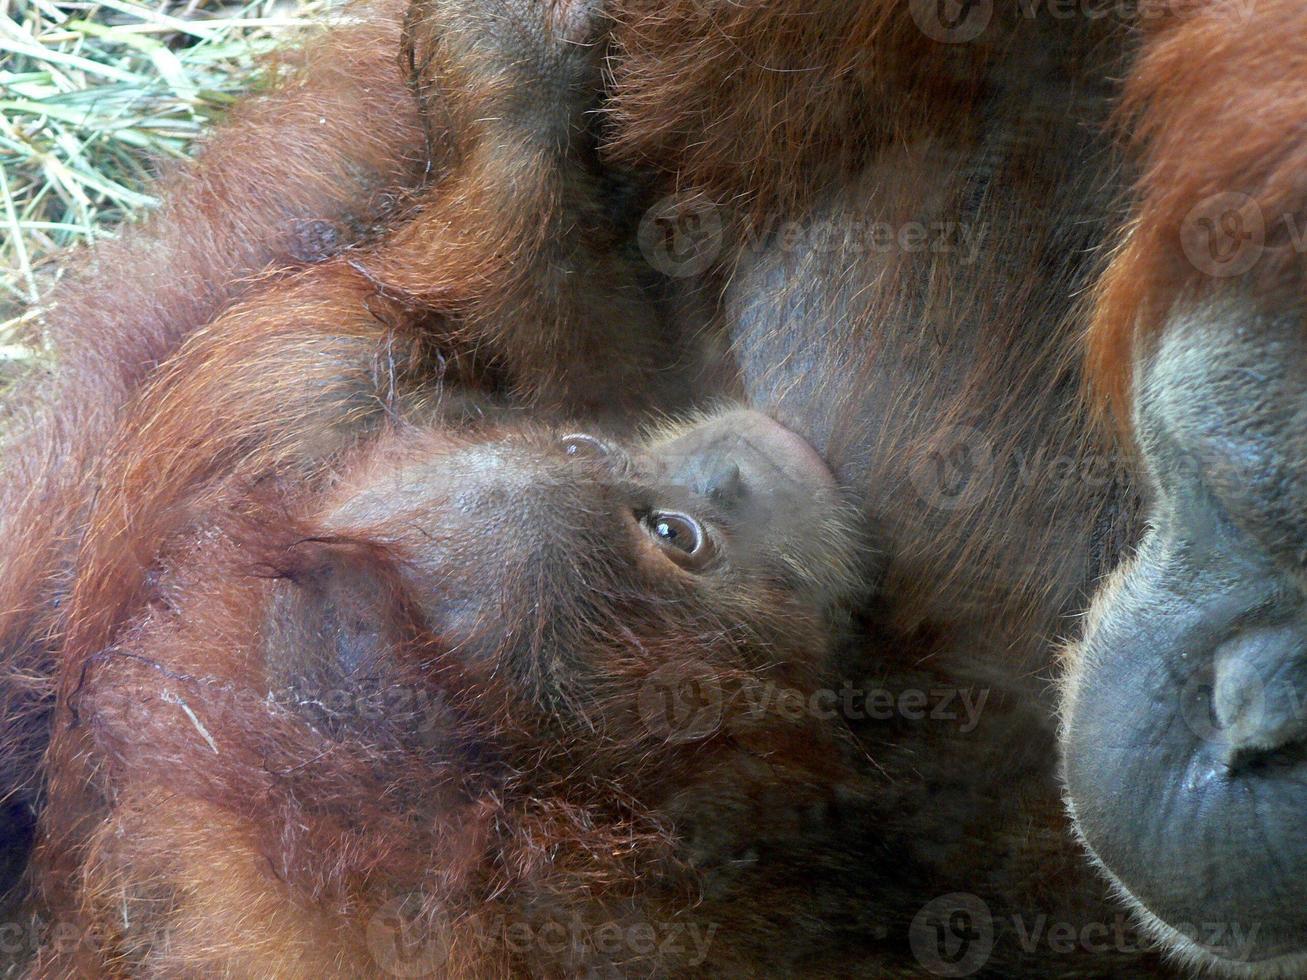 Mother and Baby Orangutan photo